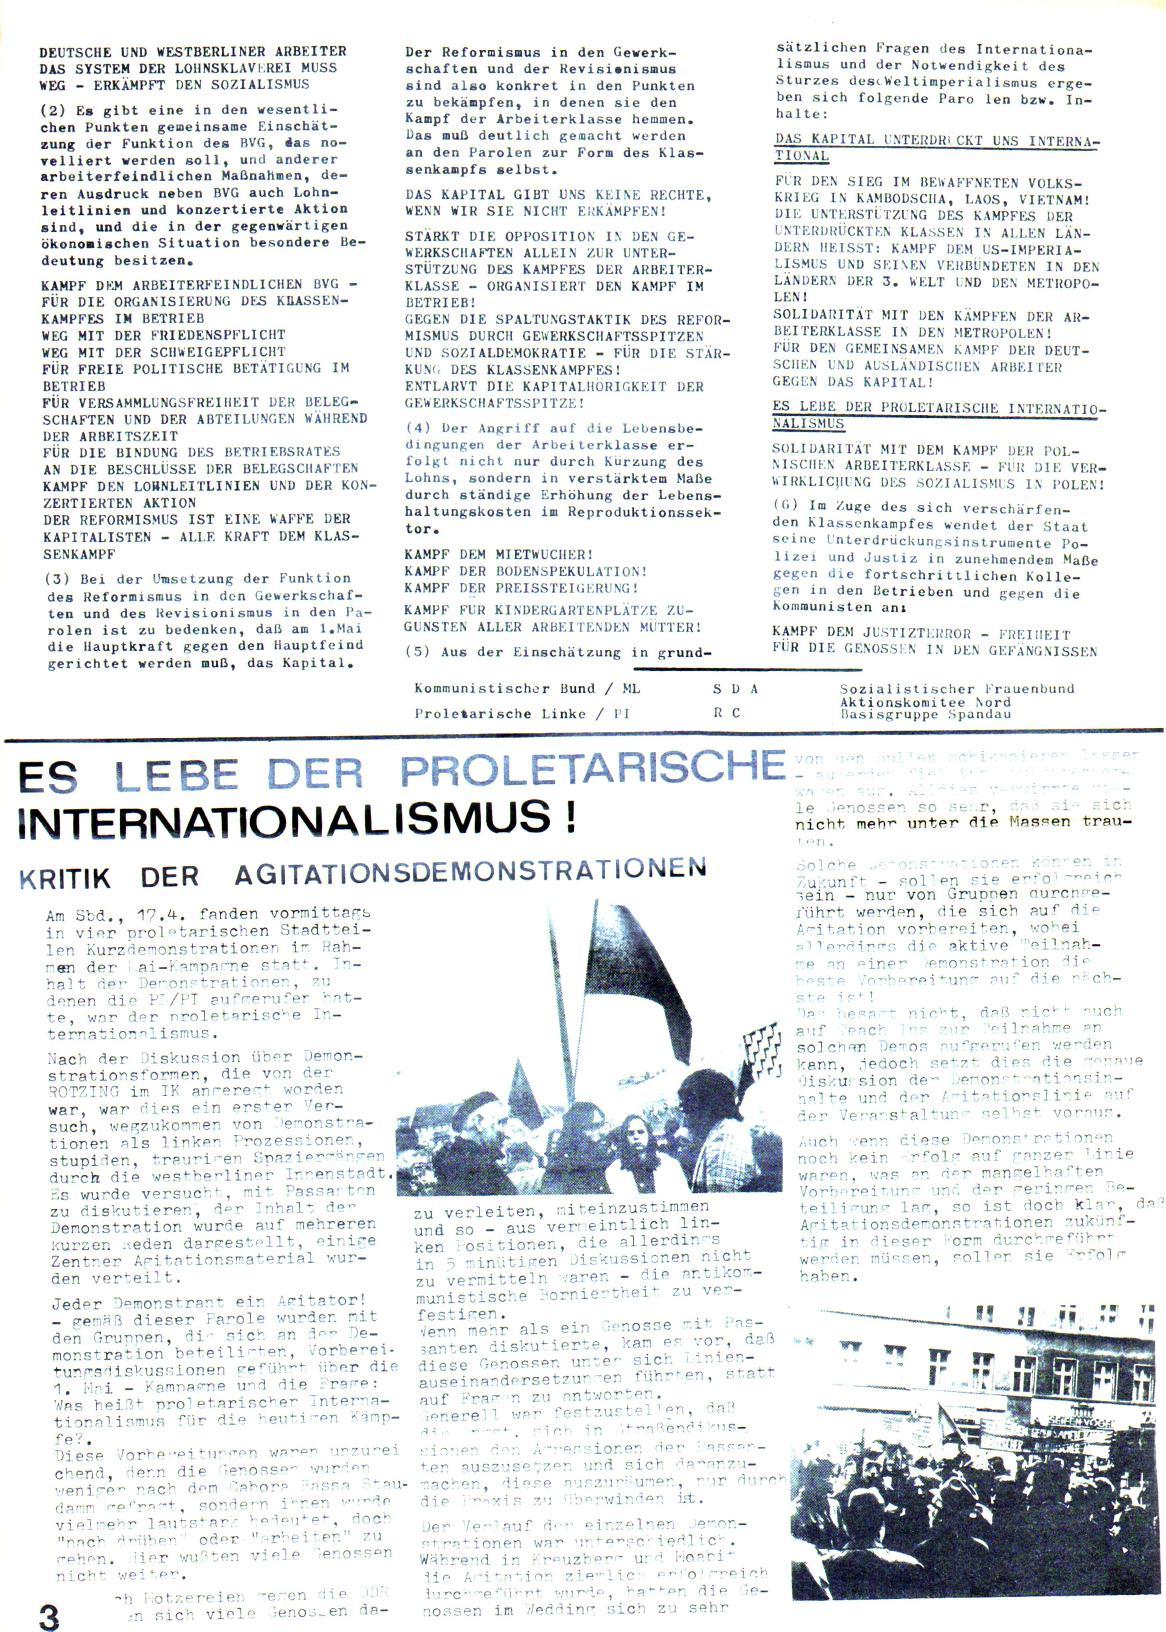 Berlin_Hochschulkampf_1971_07_03